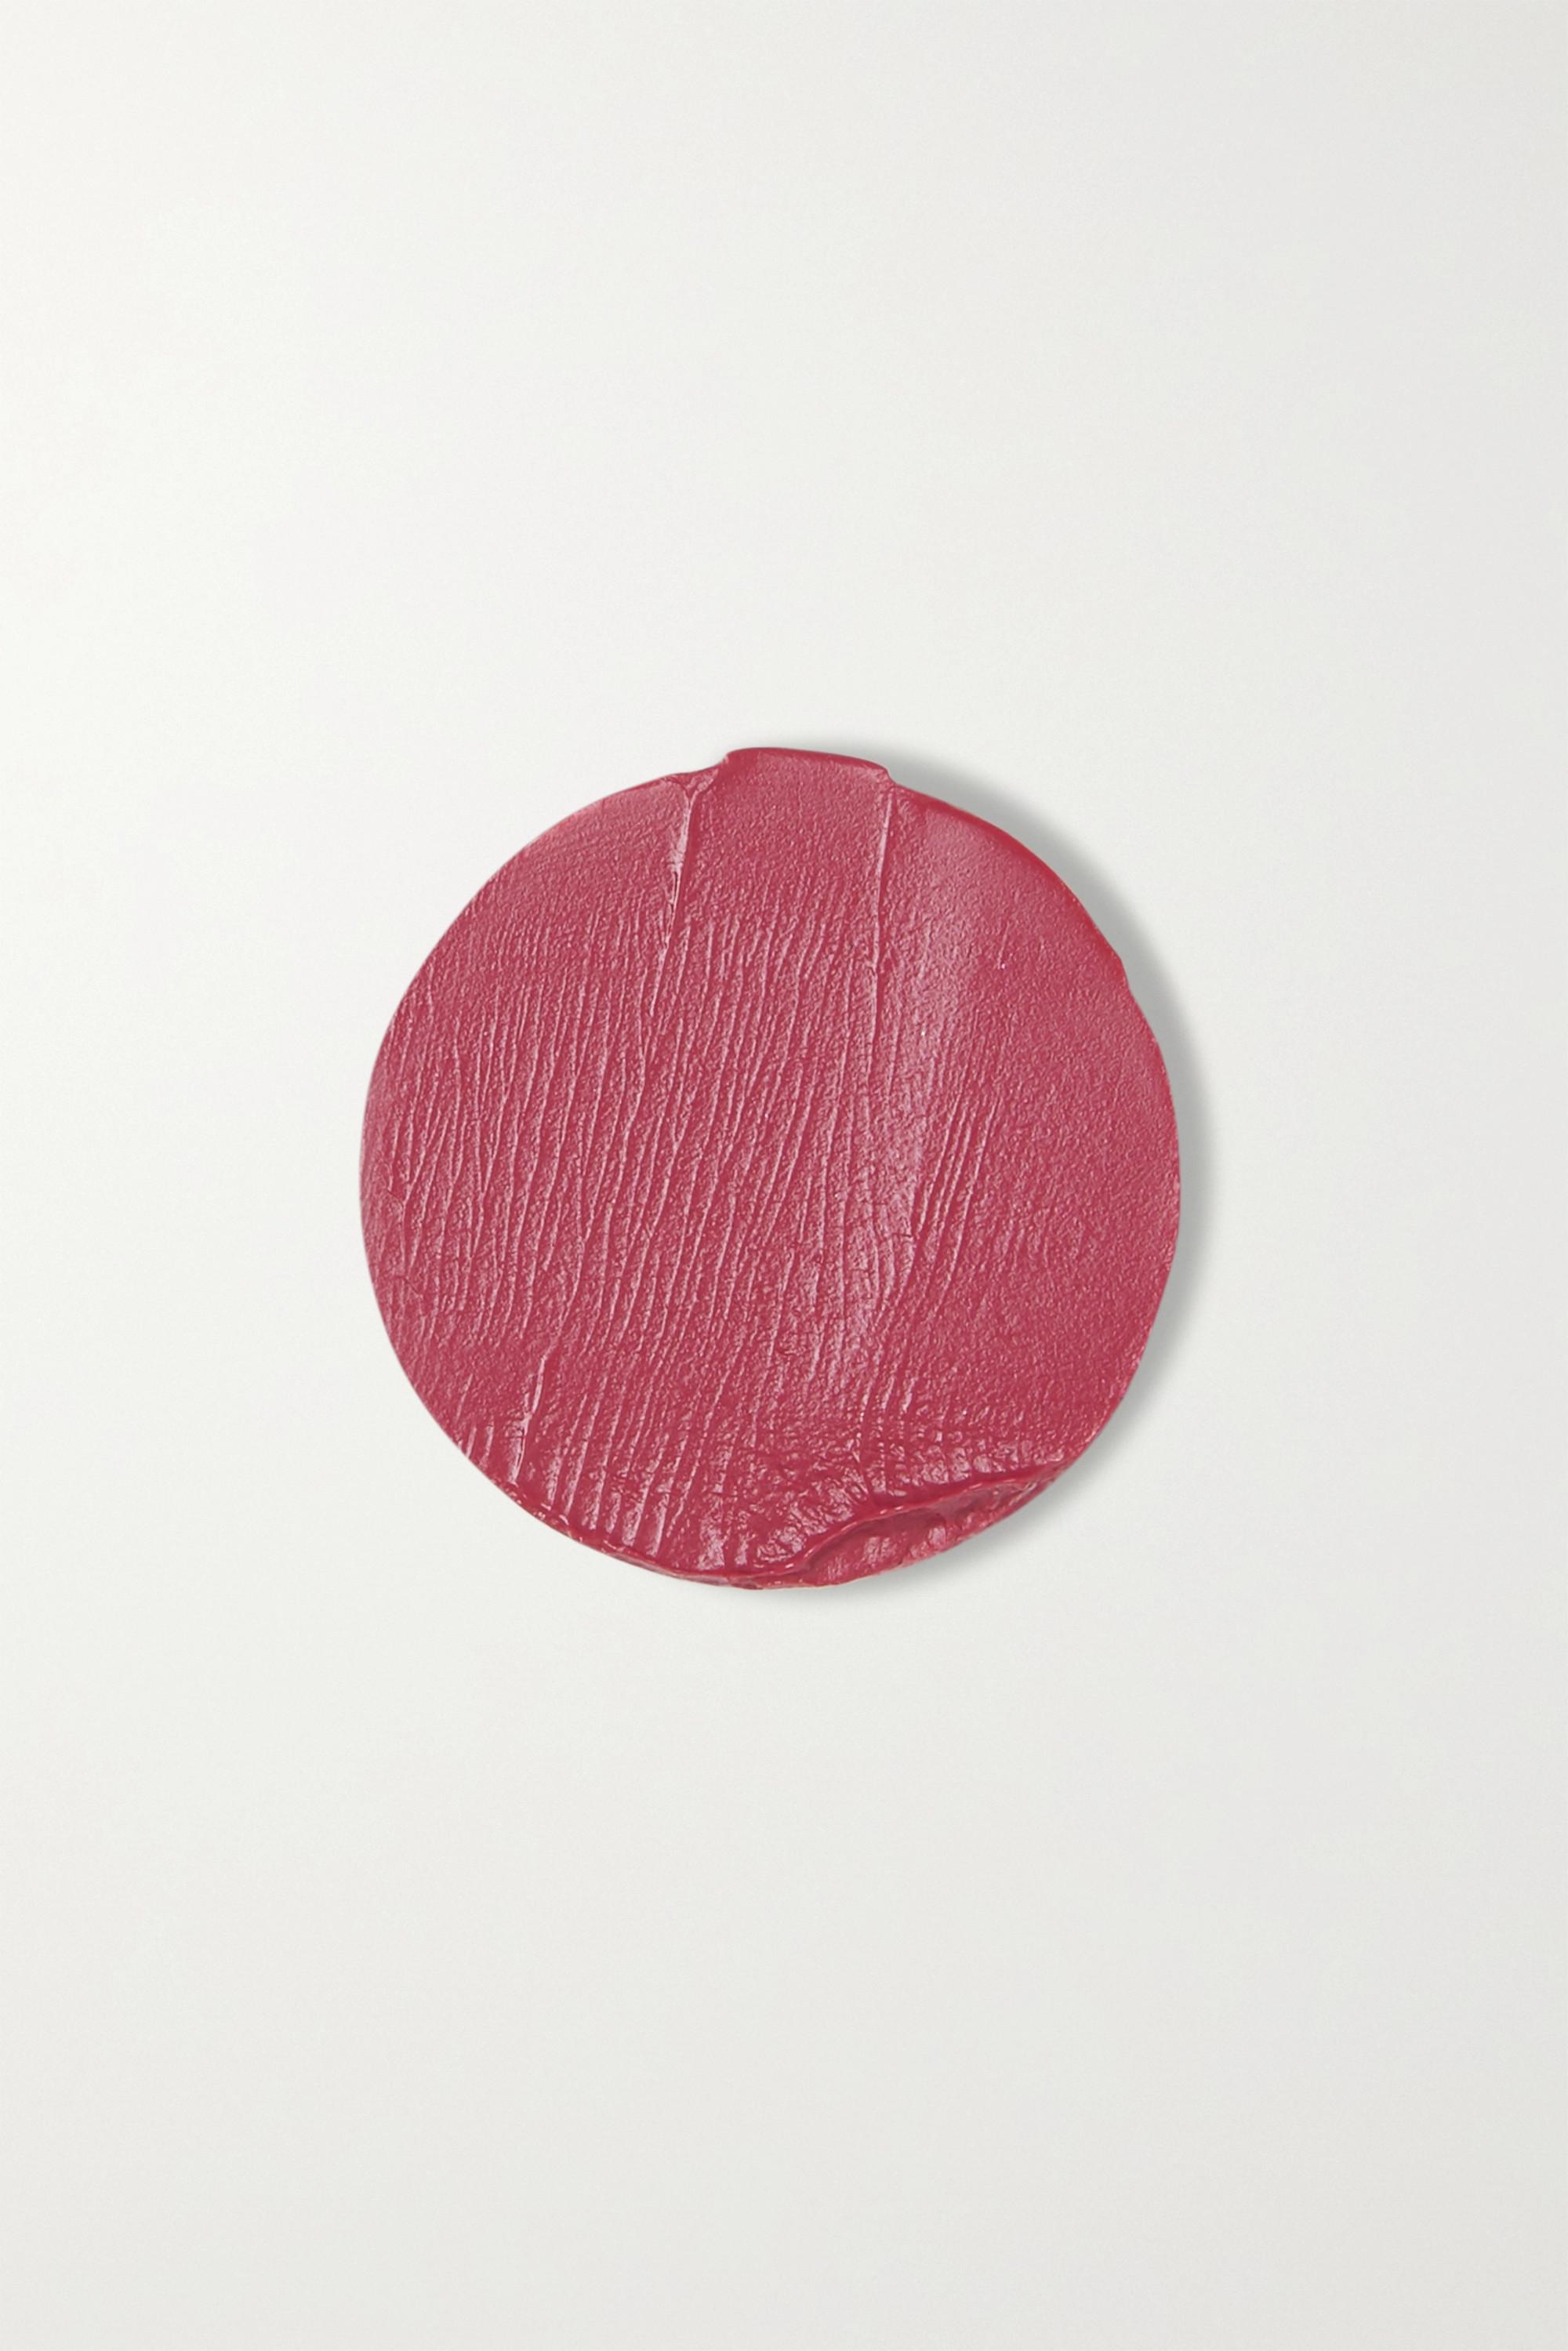 Pat McGrath Labs Lip Fetish Divinyl Lip Shine - Belle Amour